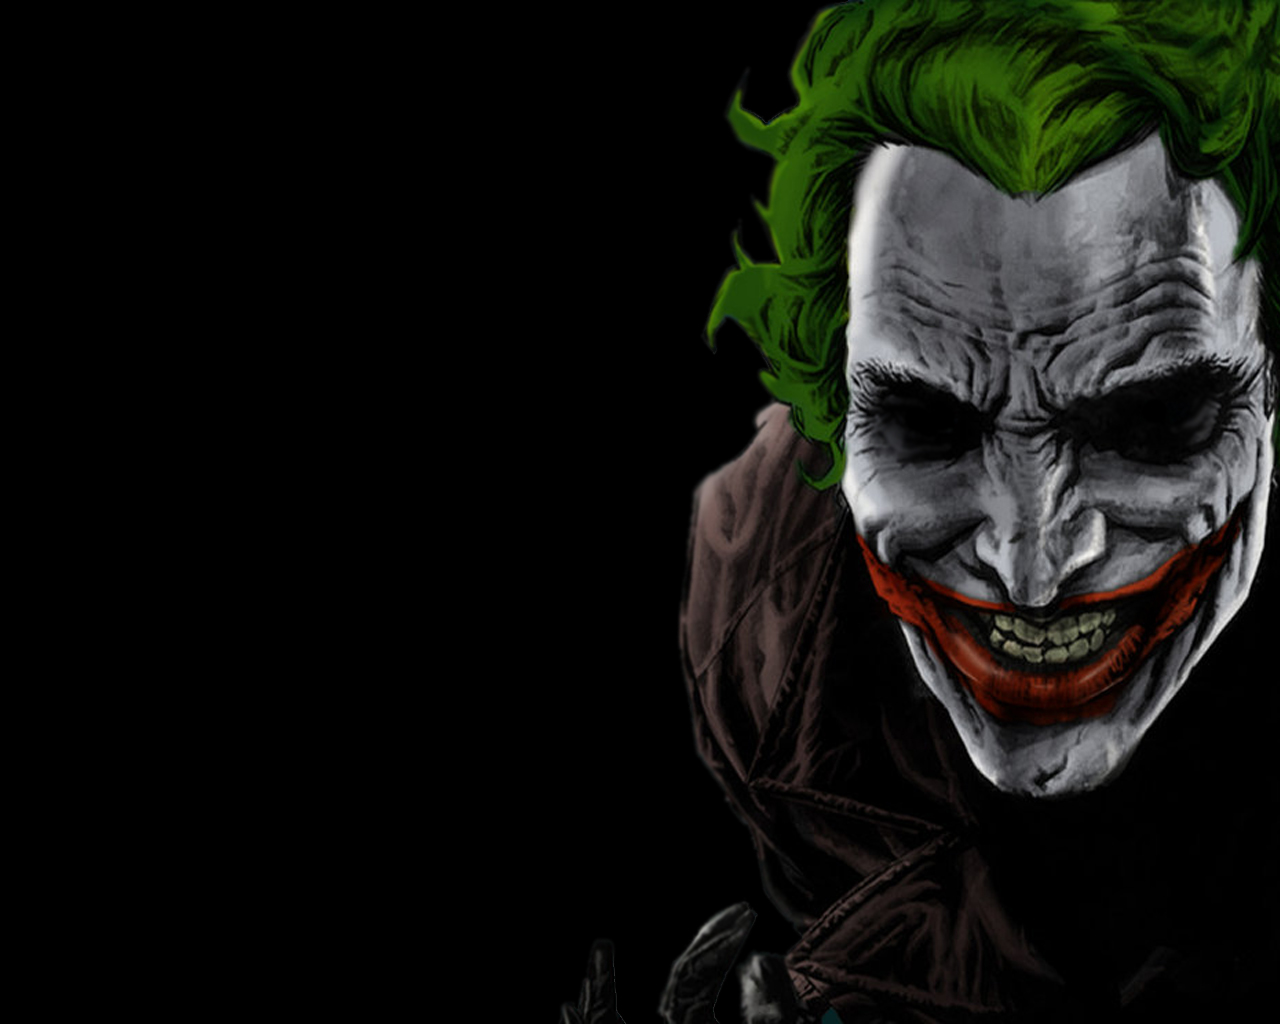 joker   The Joker Wallpaper 32586037 1280x1024